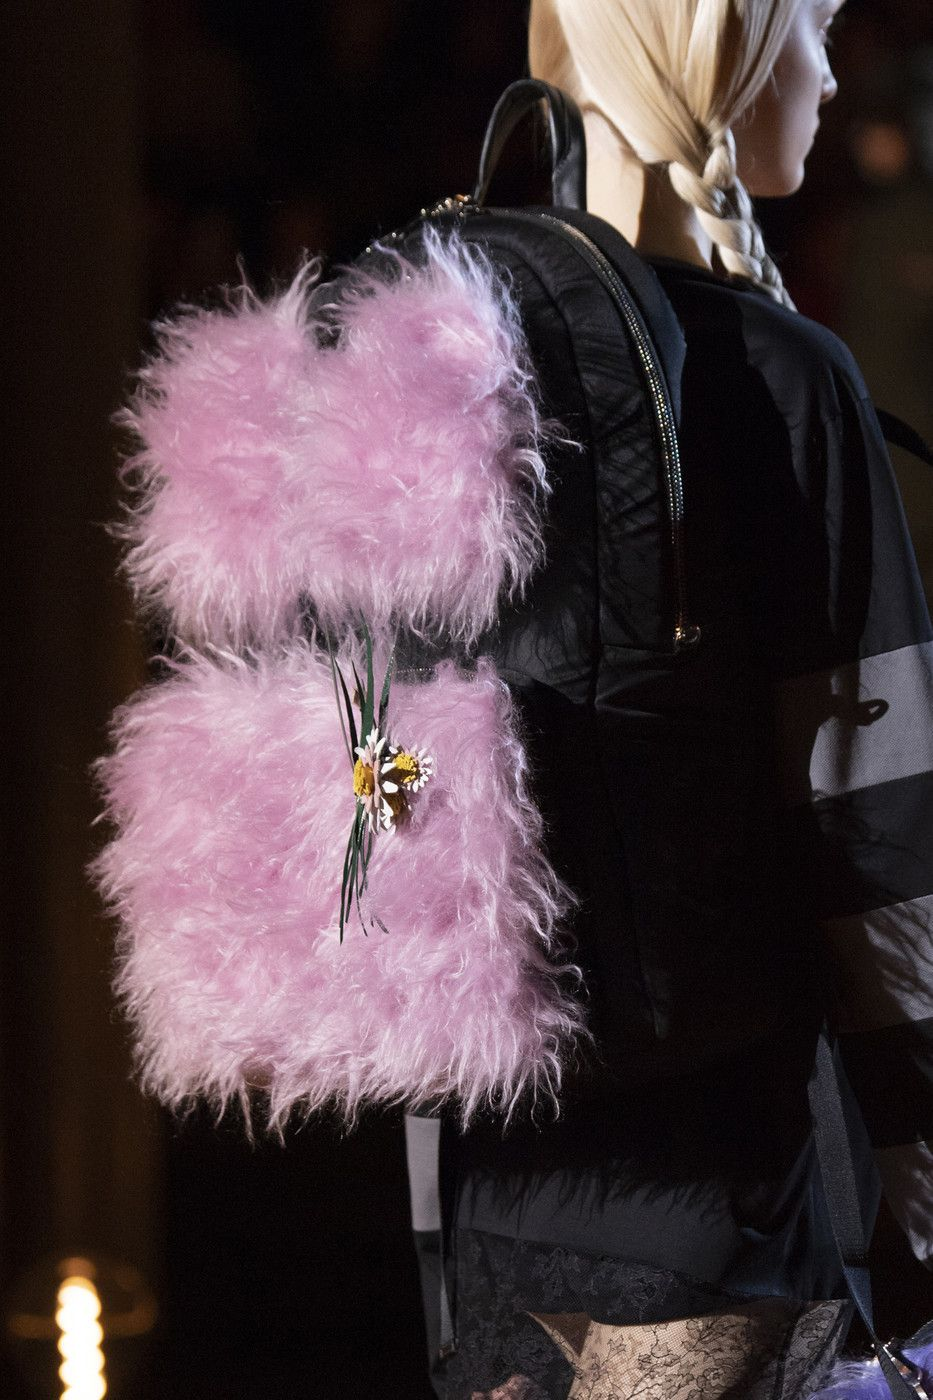 Prada RTW Fall19 - #2019 #bag #catwalk #couture #fashion #high #pink #prada #rtw #runway #style